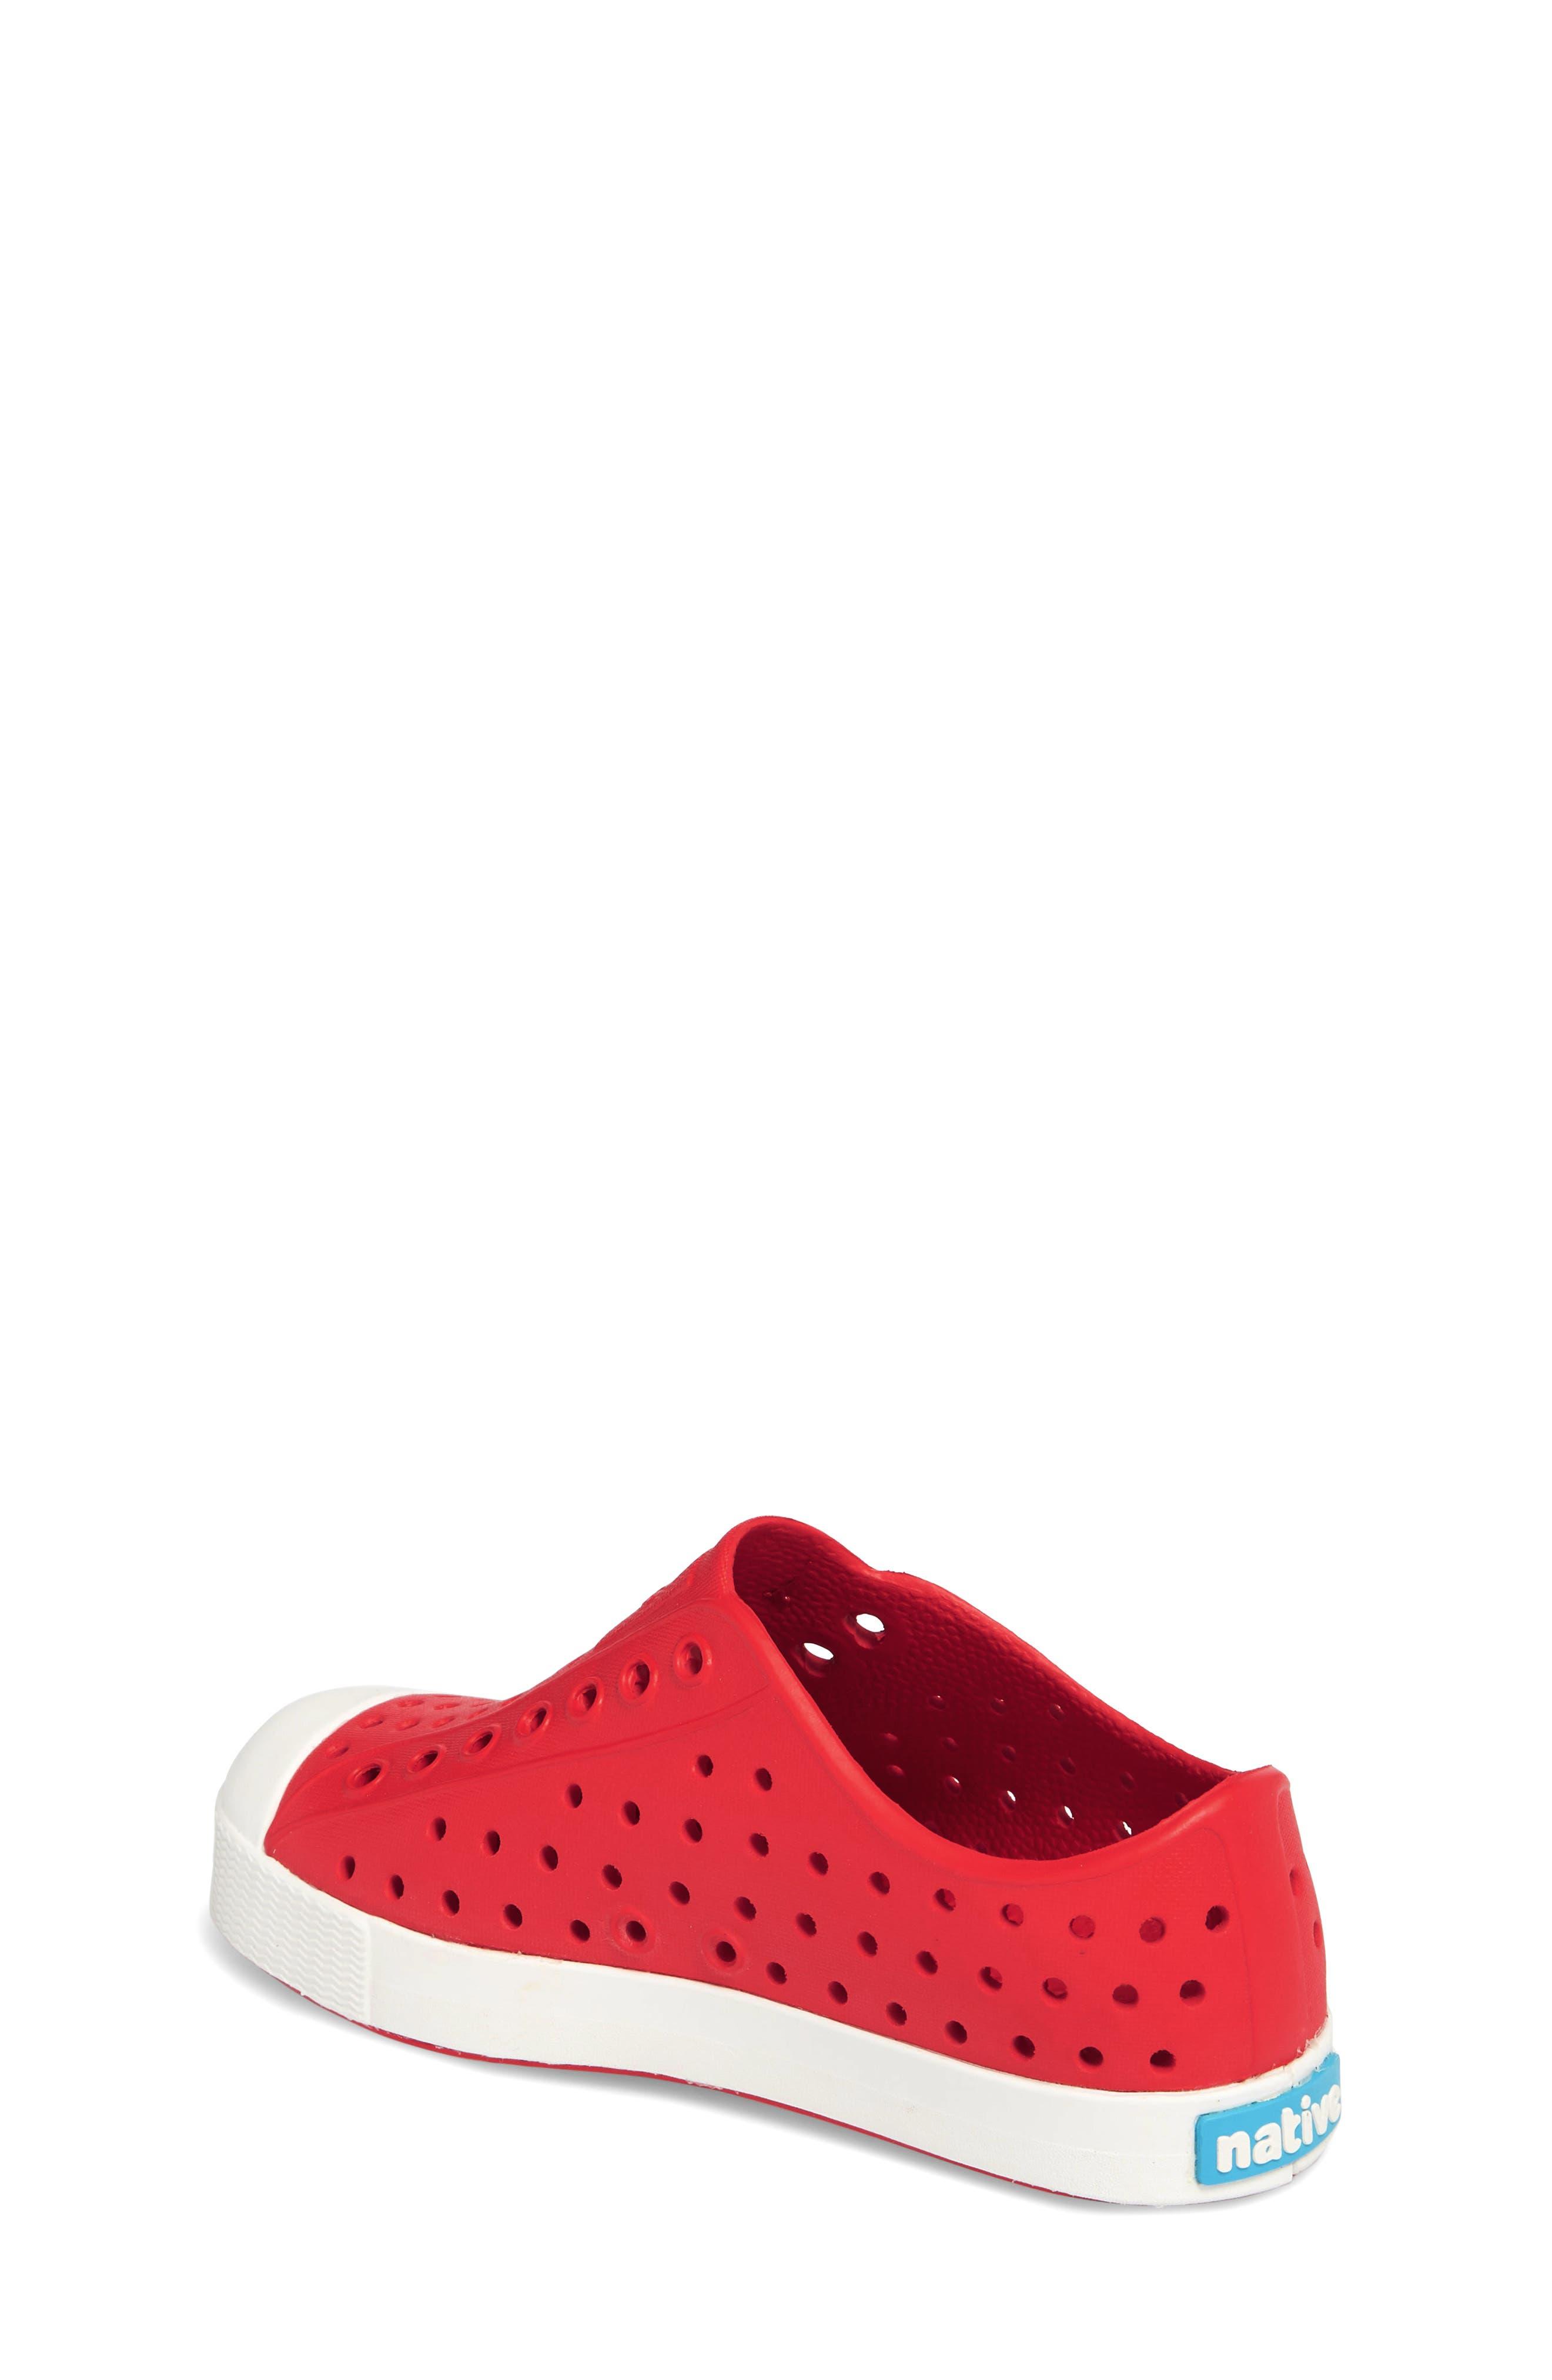 'Jefferson' Water Friendly Slip-On Sneaker,                             Alternate thumbnail 78, color,